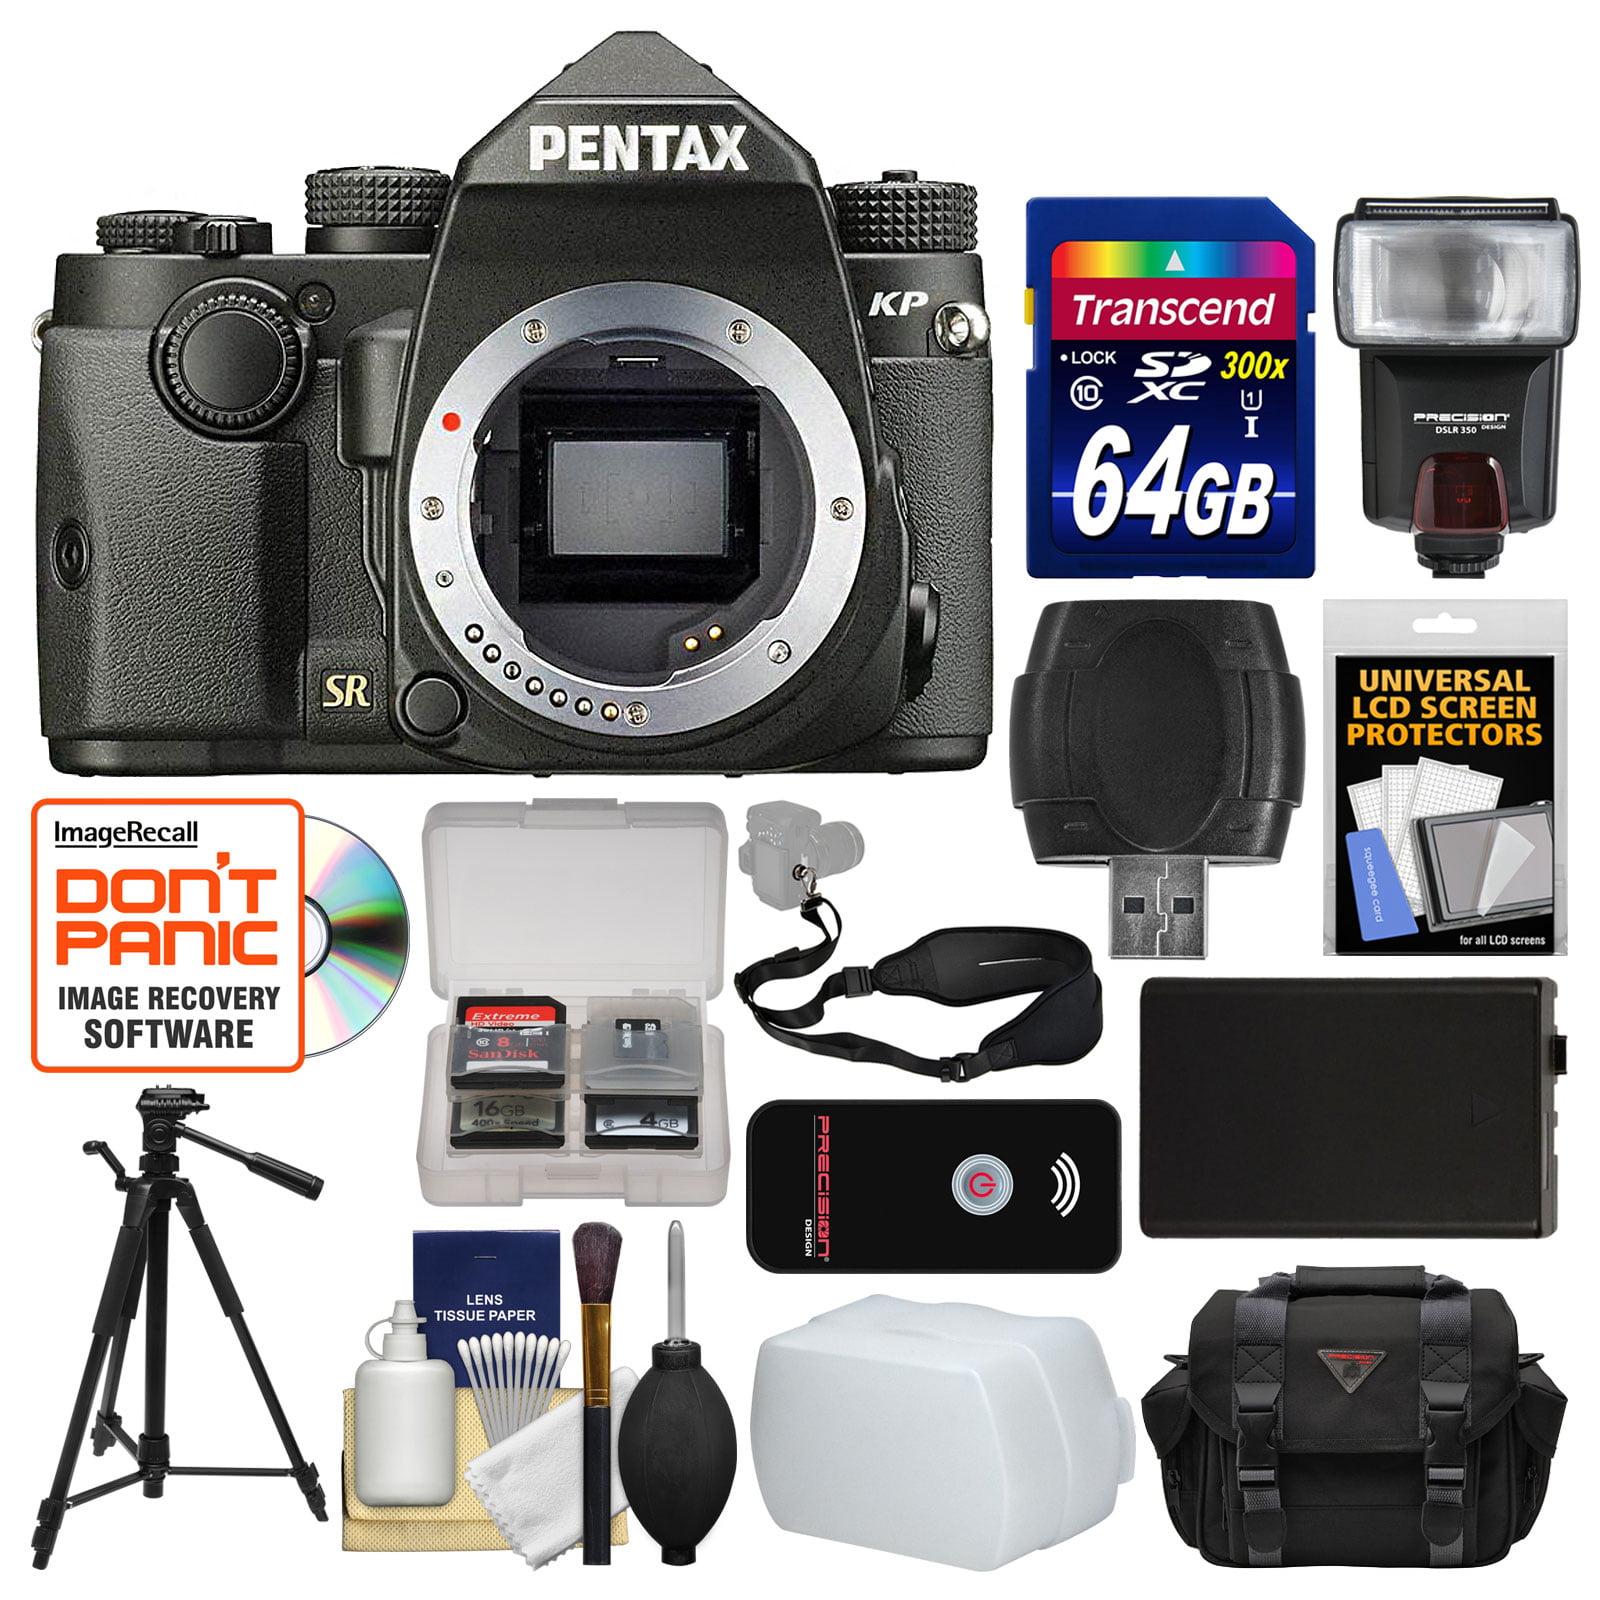 Pentax KP Wi-Fi Digital SLR Camera Body (Black) with 64GB Card + Case + Flash + Battery + Tripod + Remote +... by Pentax